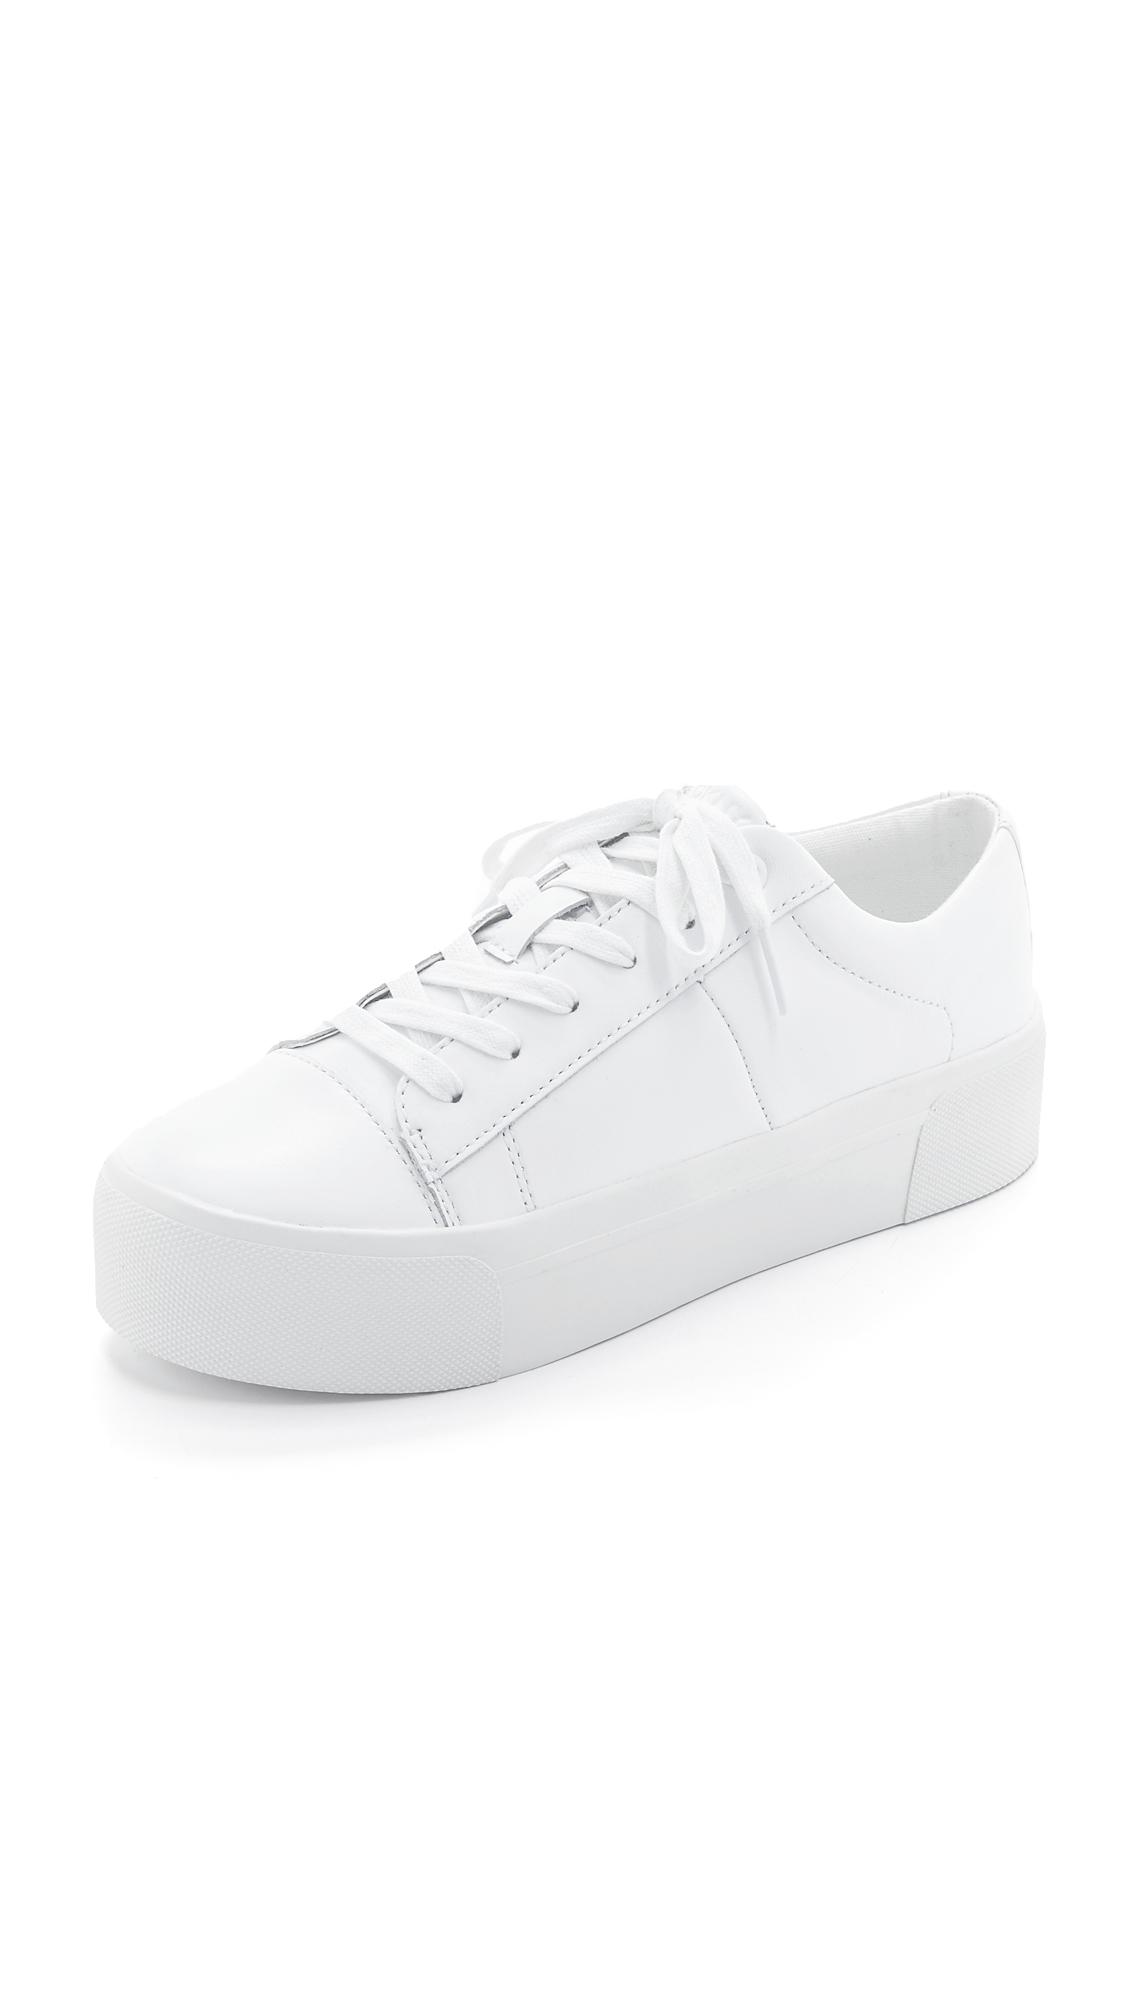 531af3f6cbb DKNY Bari Platform Sneakers